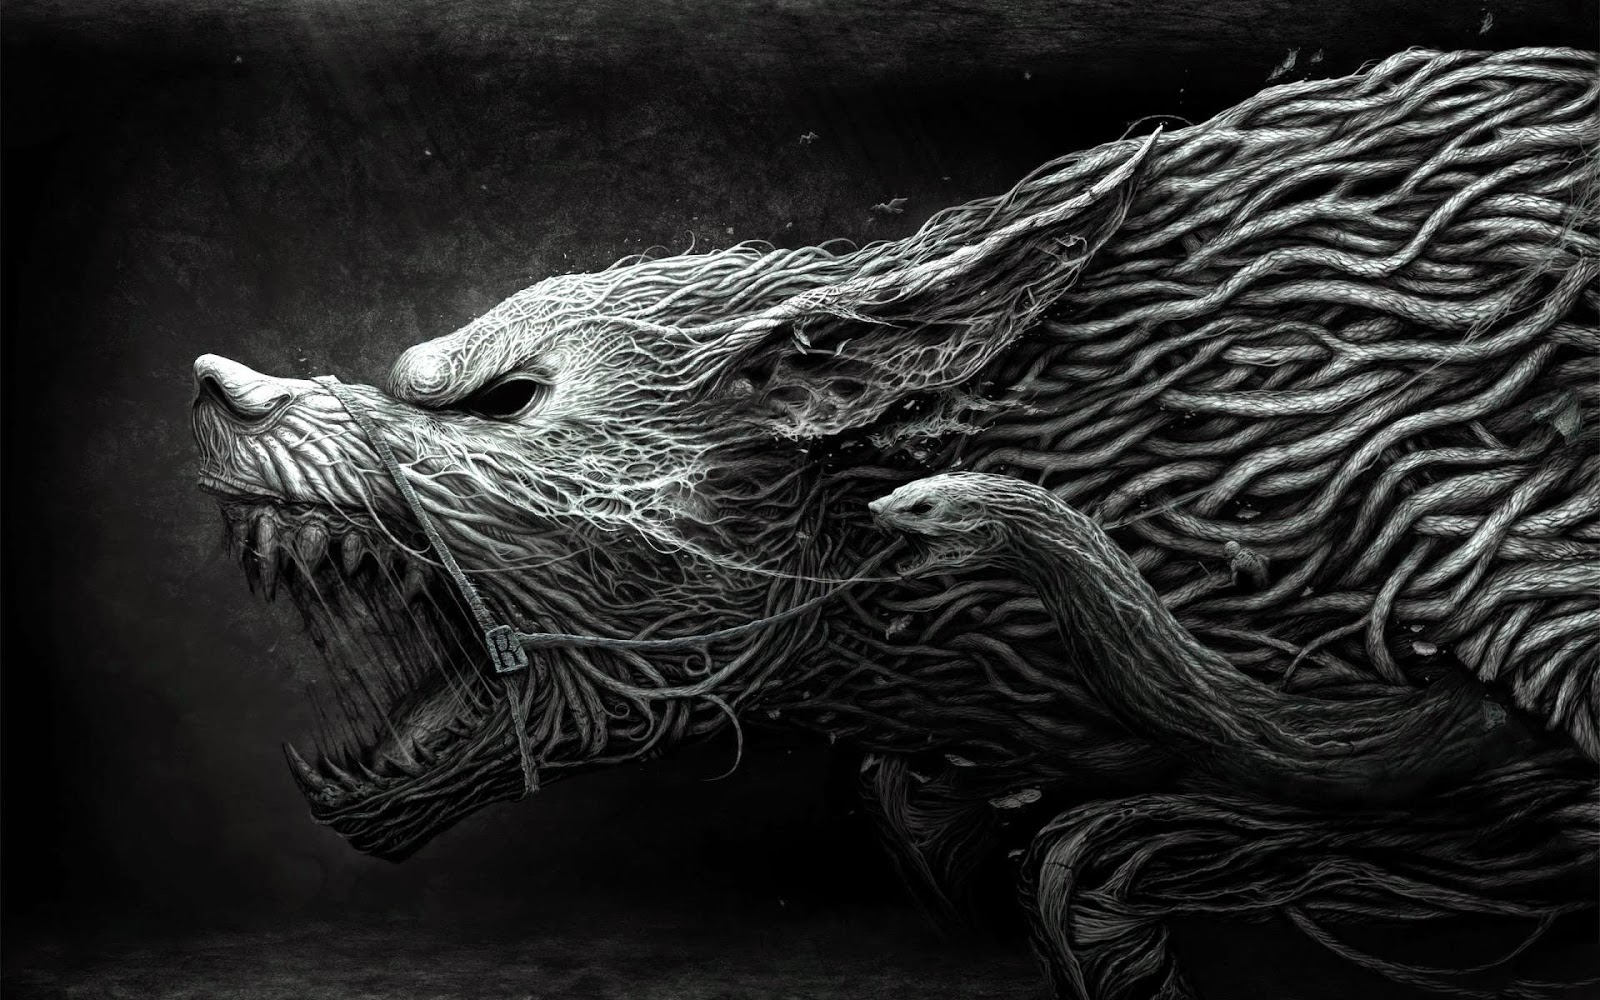 werewolf, full moon, beast, mythology, werewolf mythology, werewolf origins